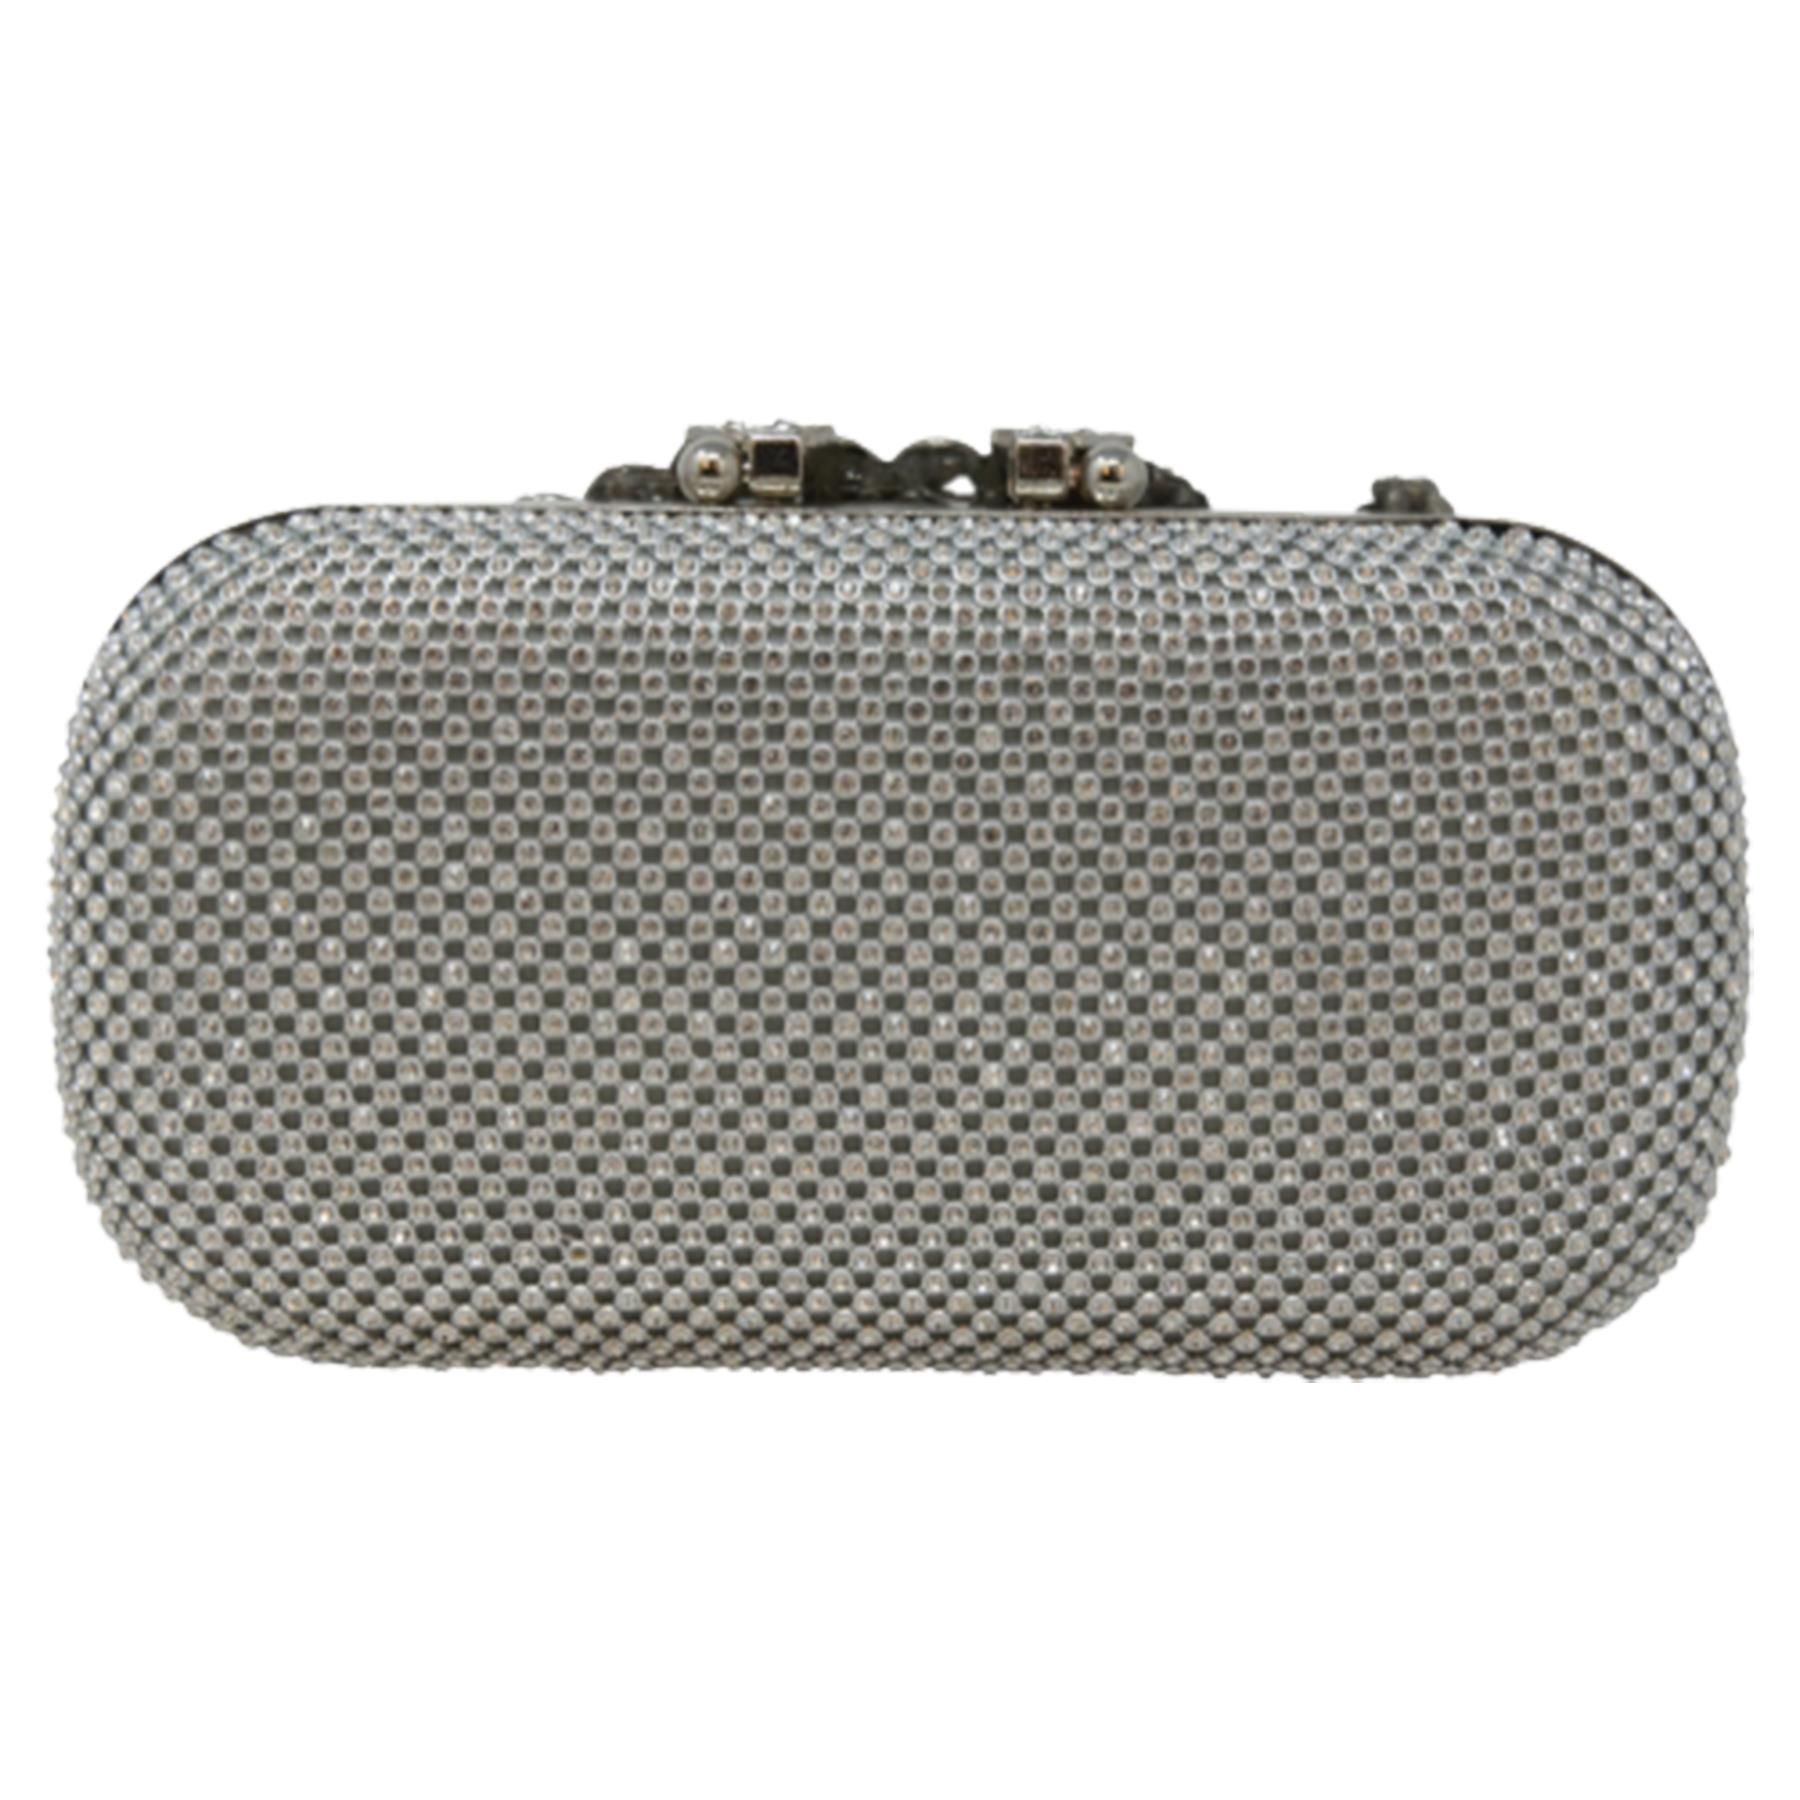 New-Women-s-Jewel-Elephant-Detail-Diamante-Chain-Box-Clutch-Bag-Purse thumbnail 15